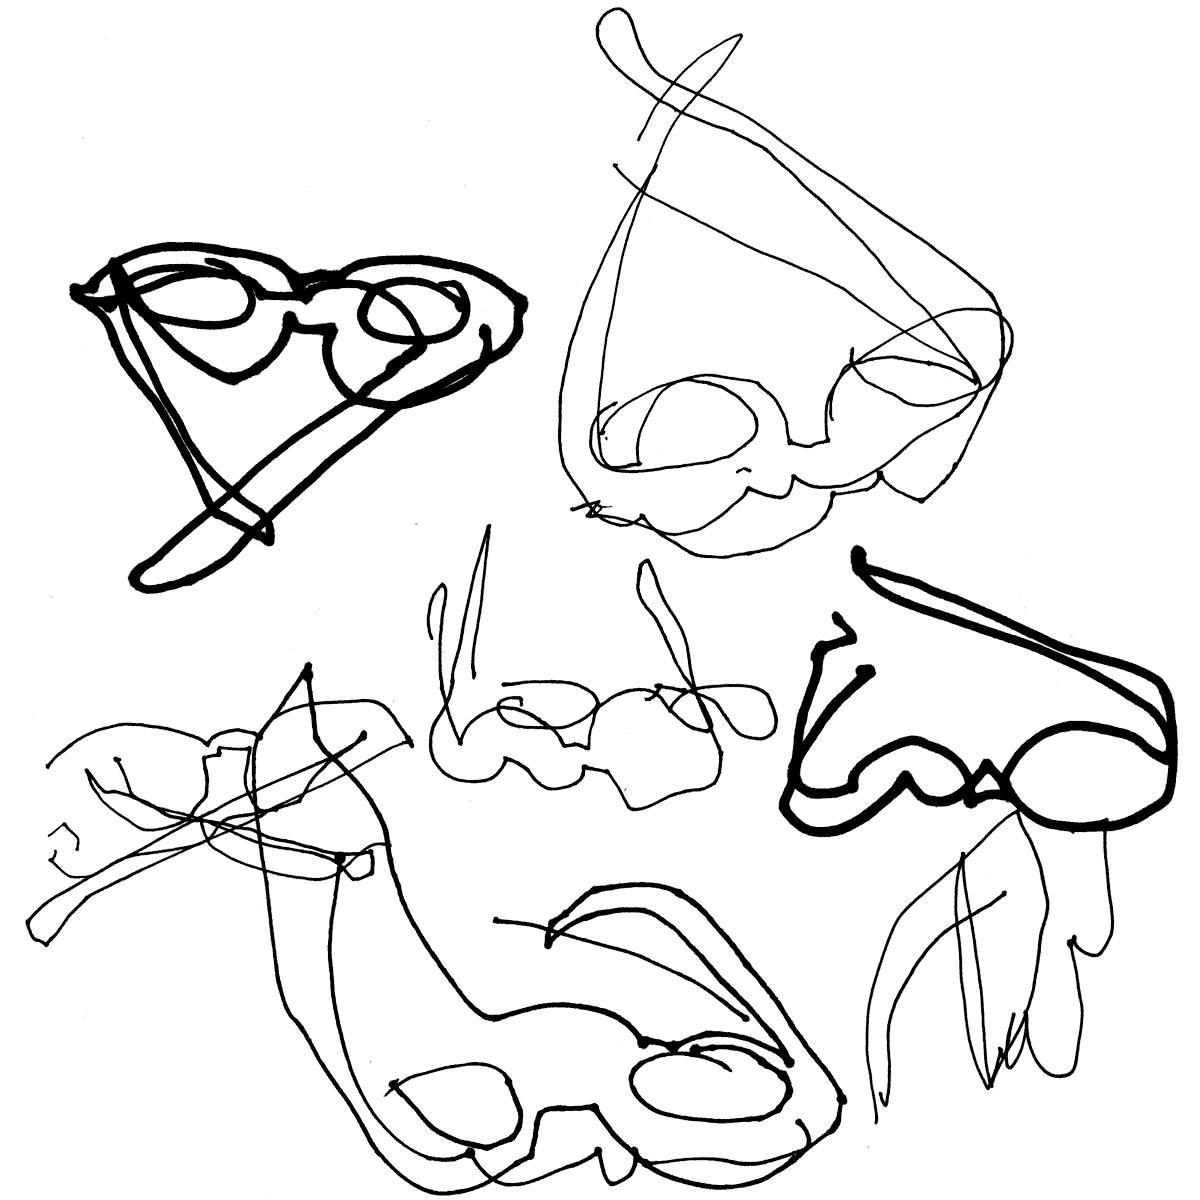 glassesdrawing.jpg